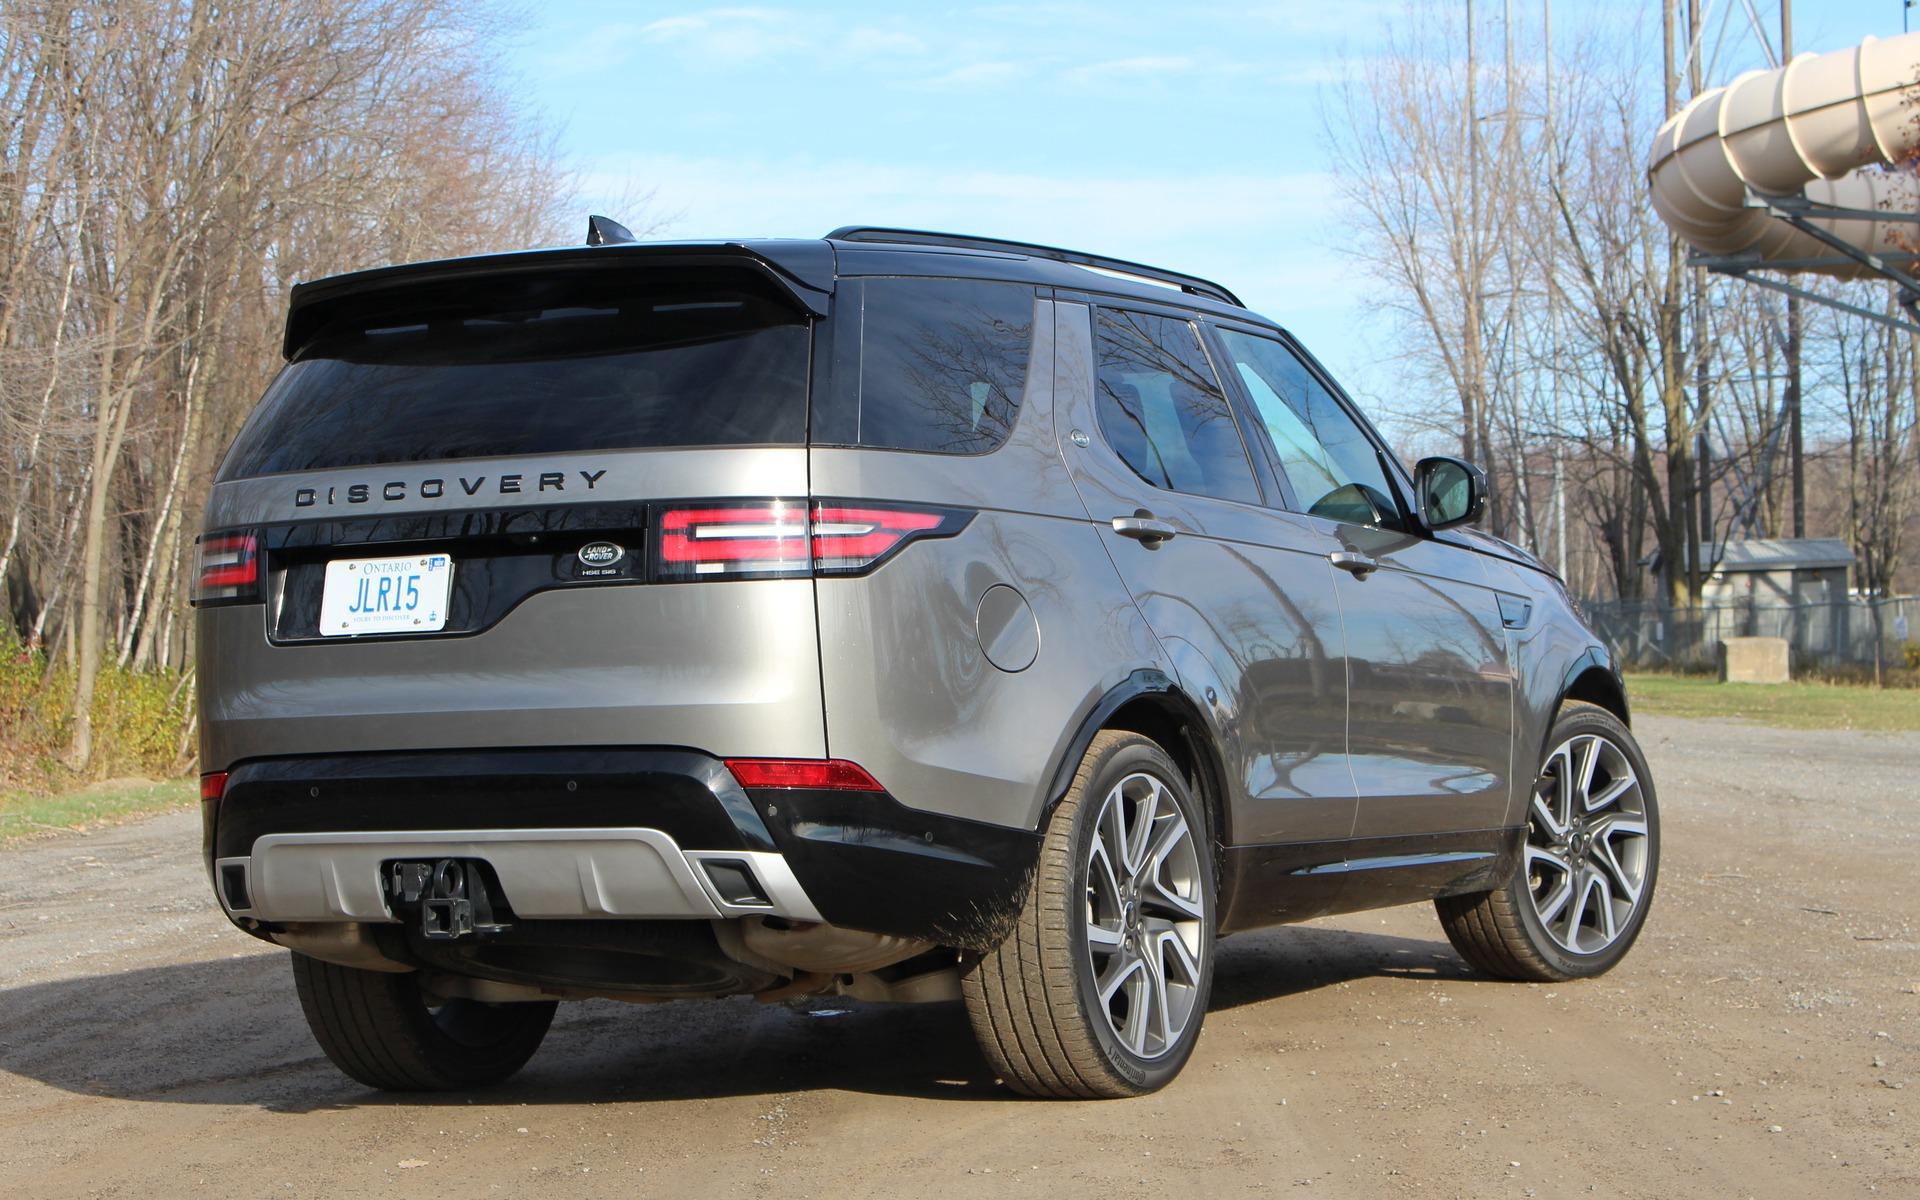 dealers range news rover look ct three first en motor in velar land trend canada front landrover quarters